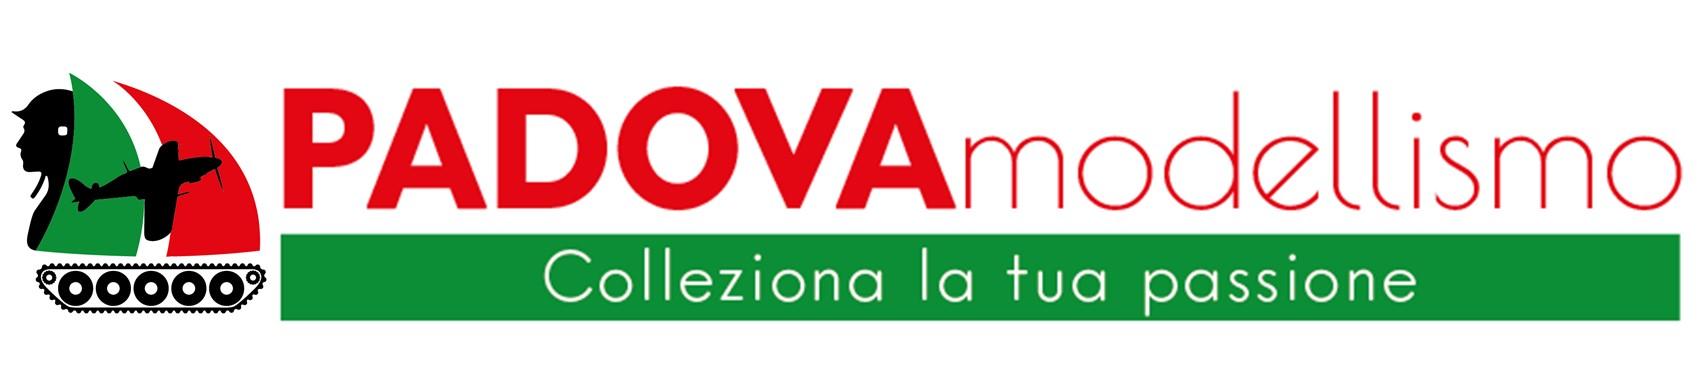 Padova Modellismo